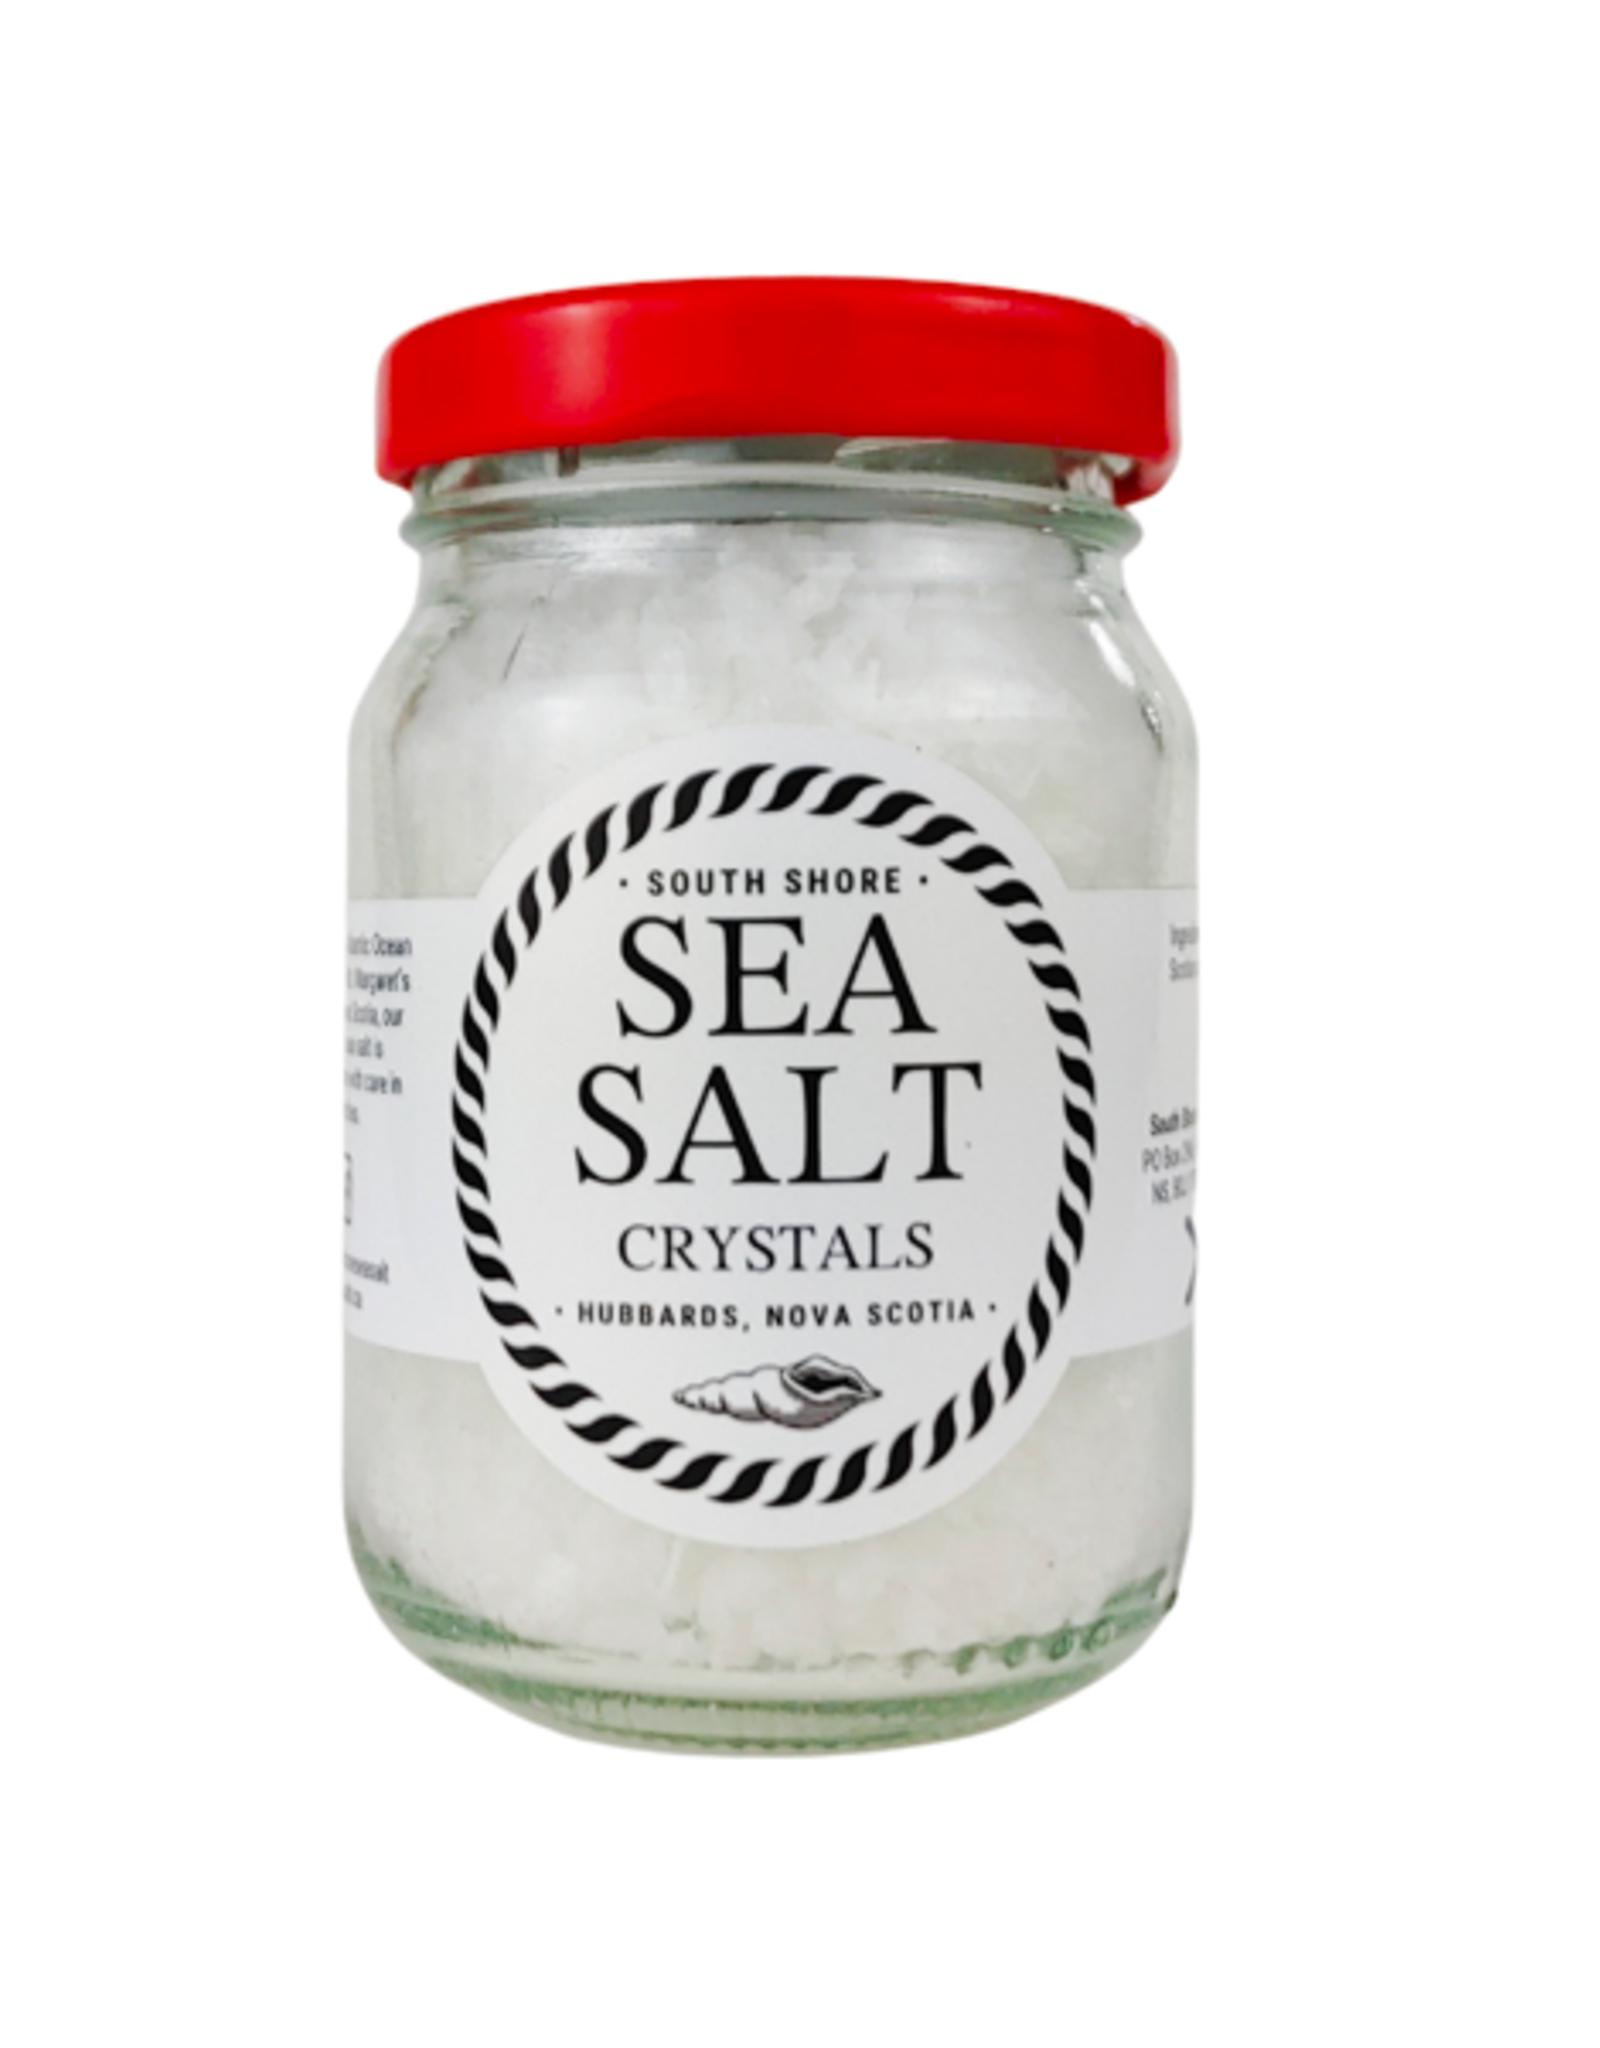 South Shore Sea Salt / Finishing Salt,  Crystal Sea Salts, 75g